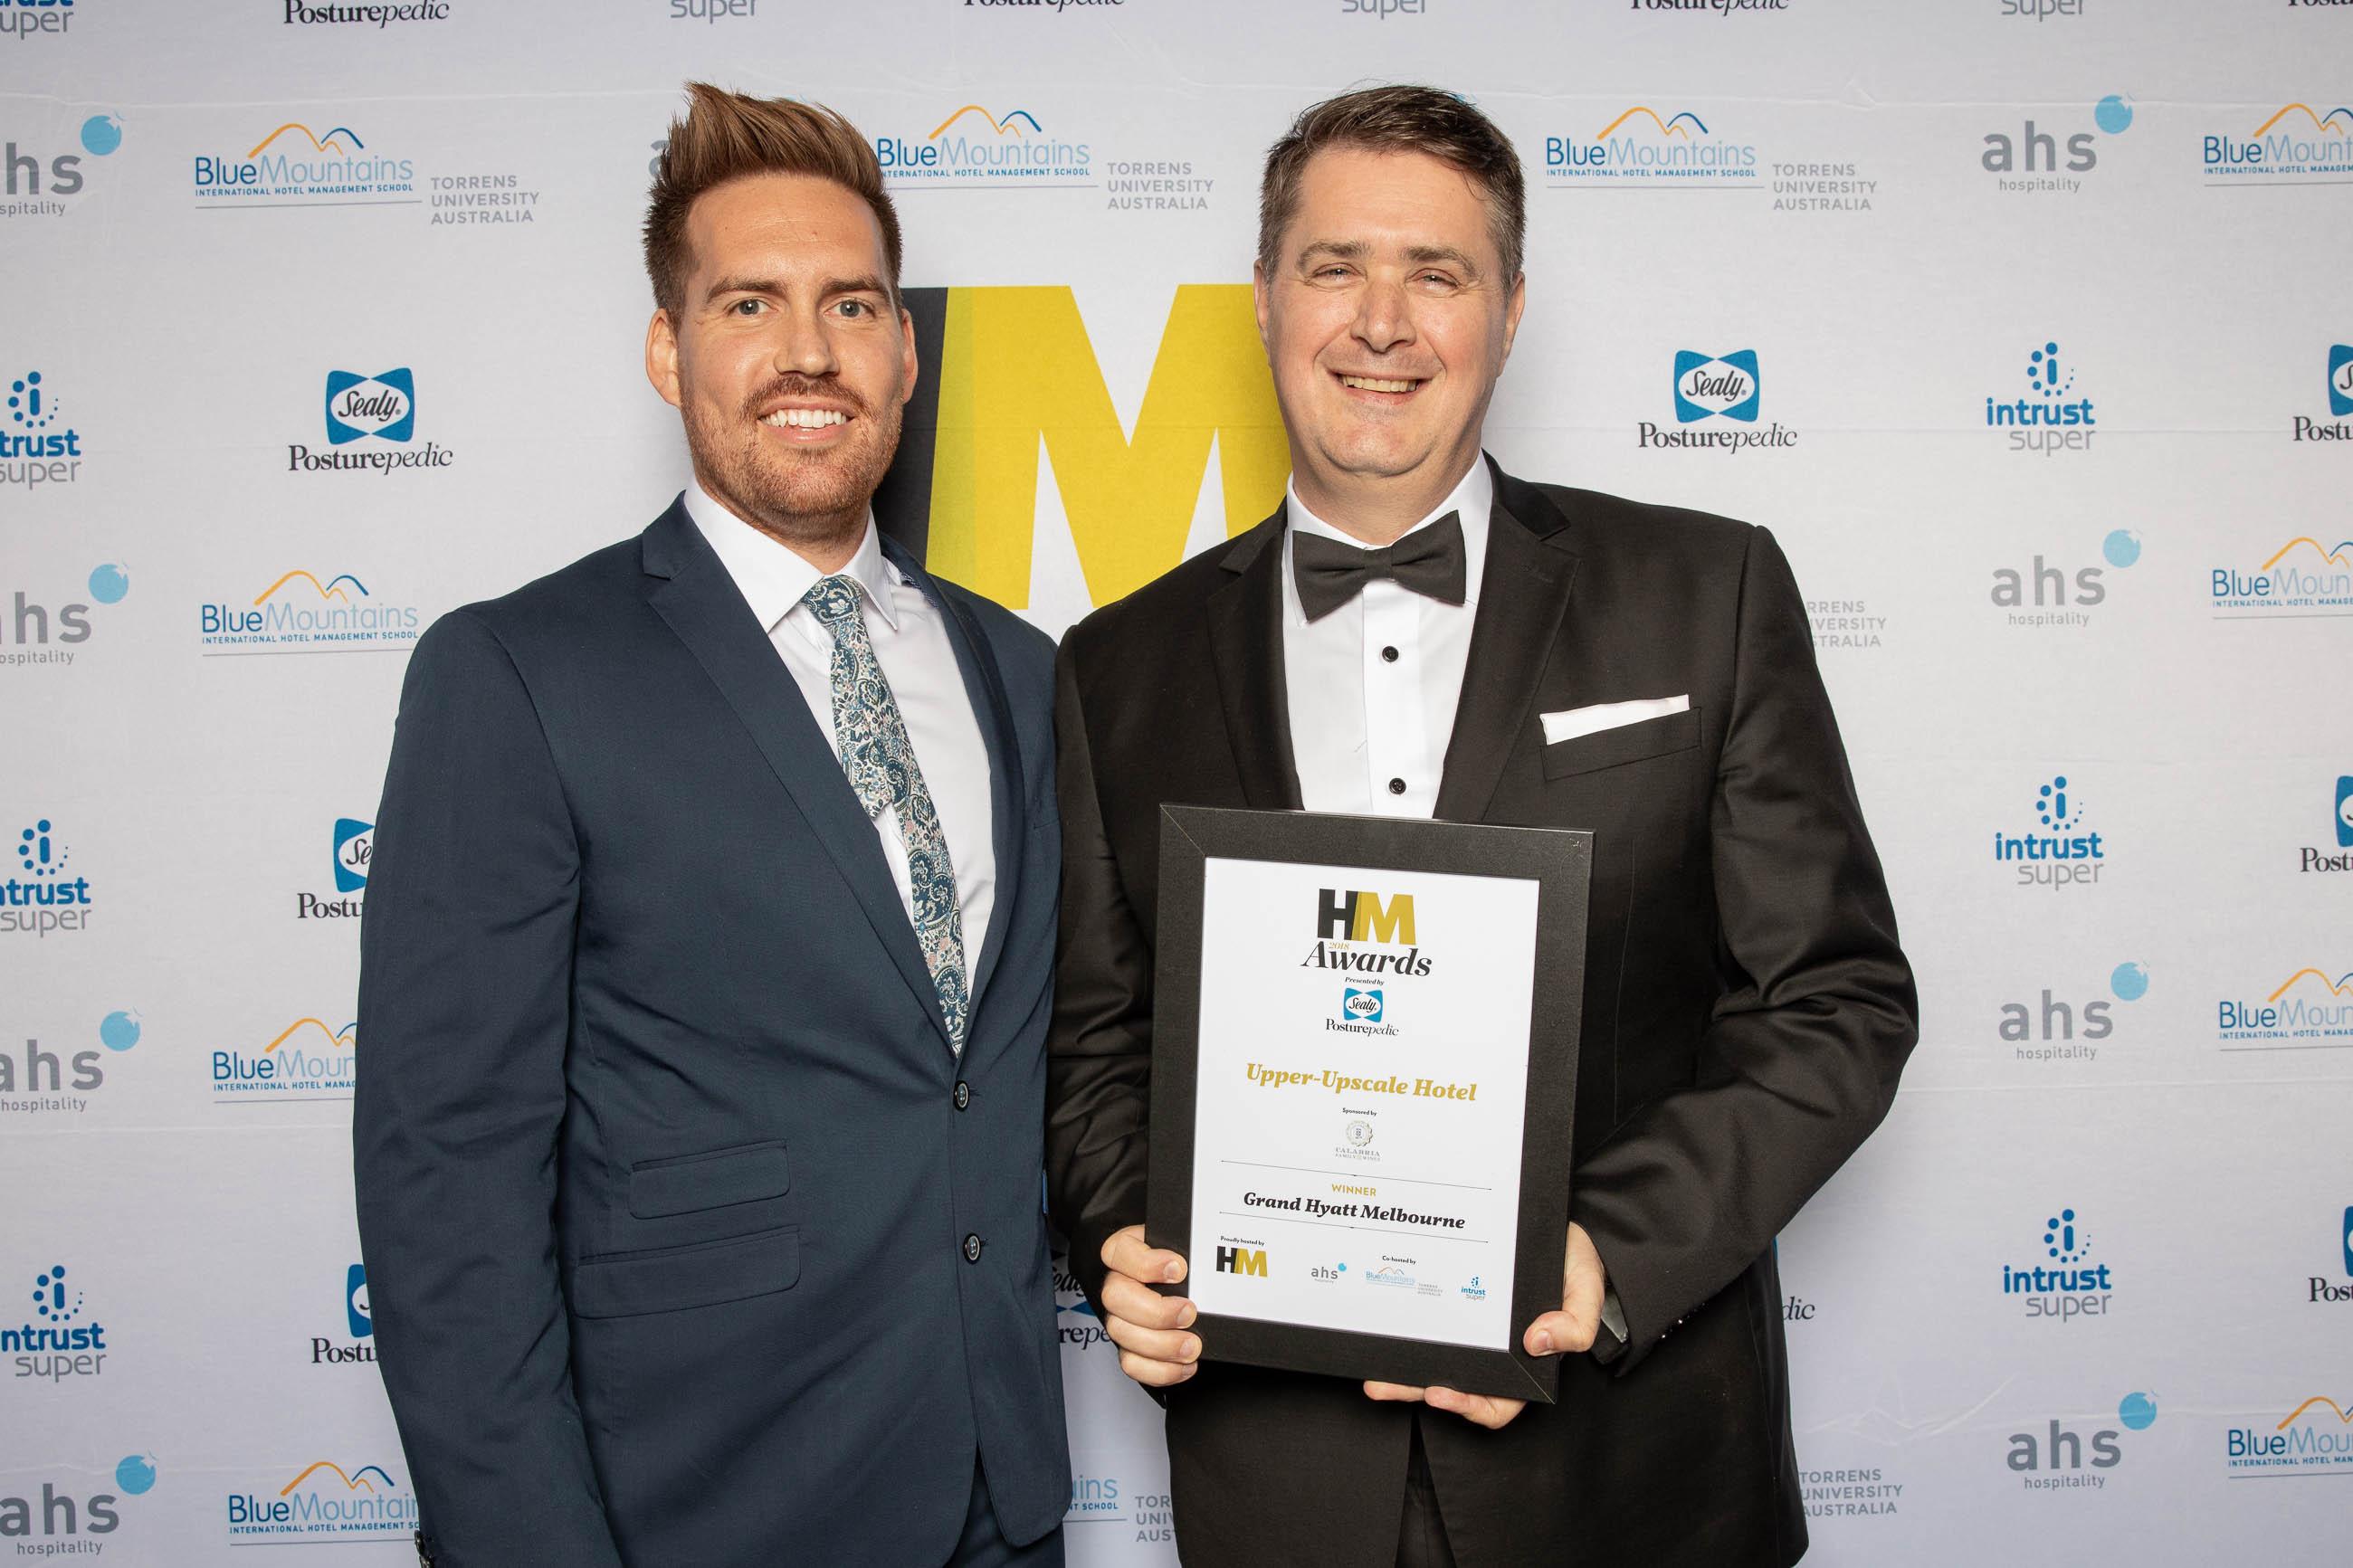 72ppi-HMawards-2018-official-award-wall-2626